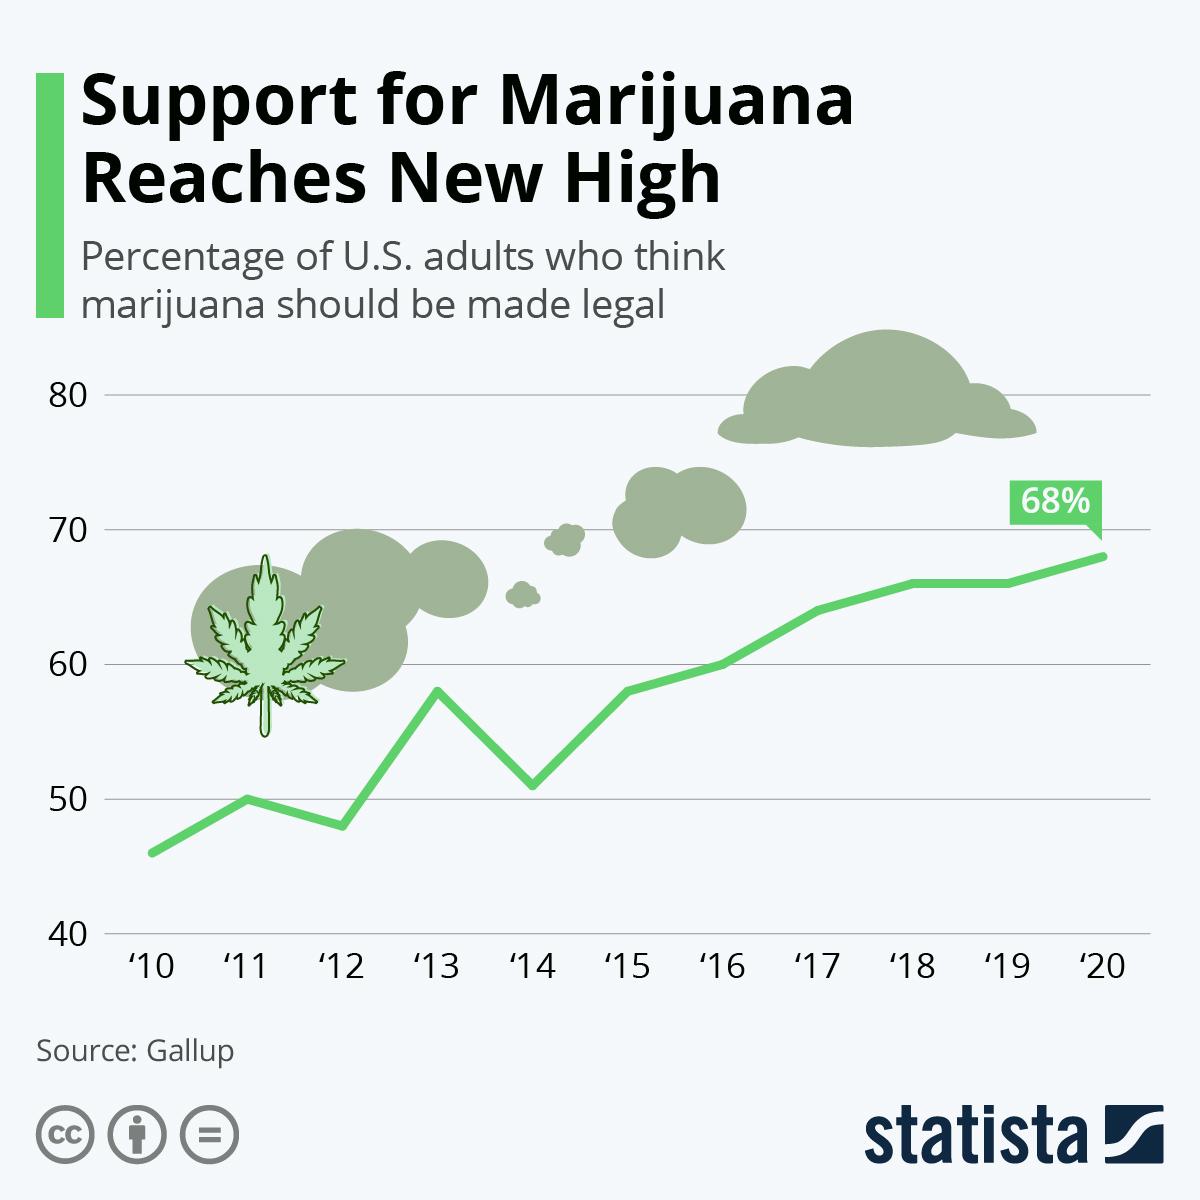 Marijuana support hits record high